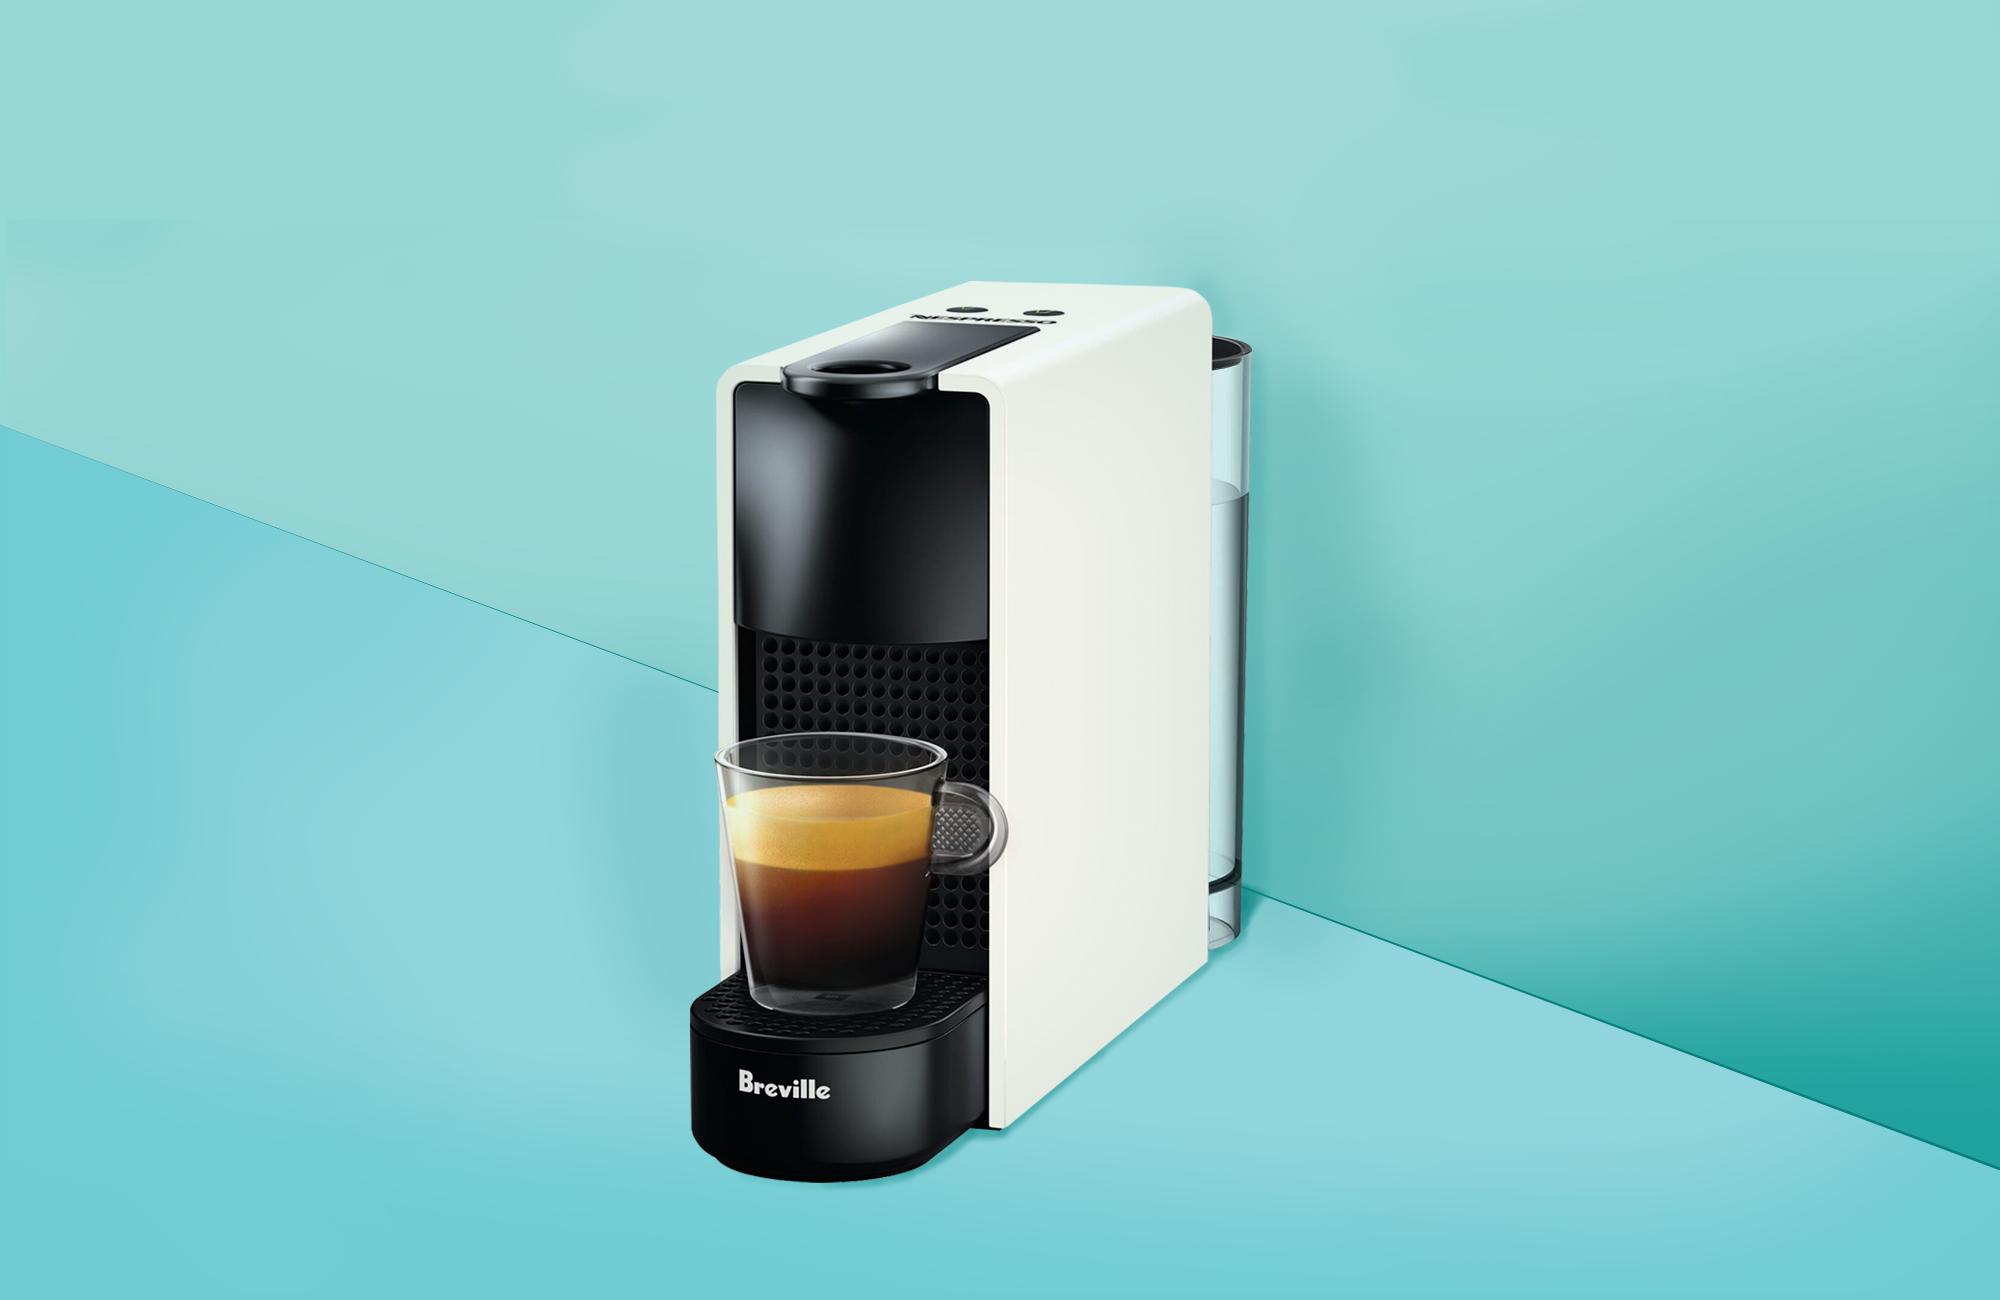 10 Best Espresso Machines 2021 Top Espresso Maker Reviews